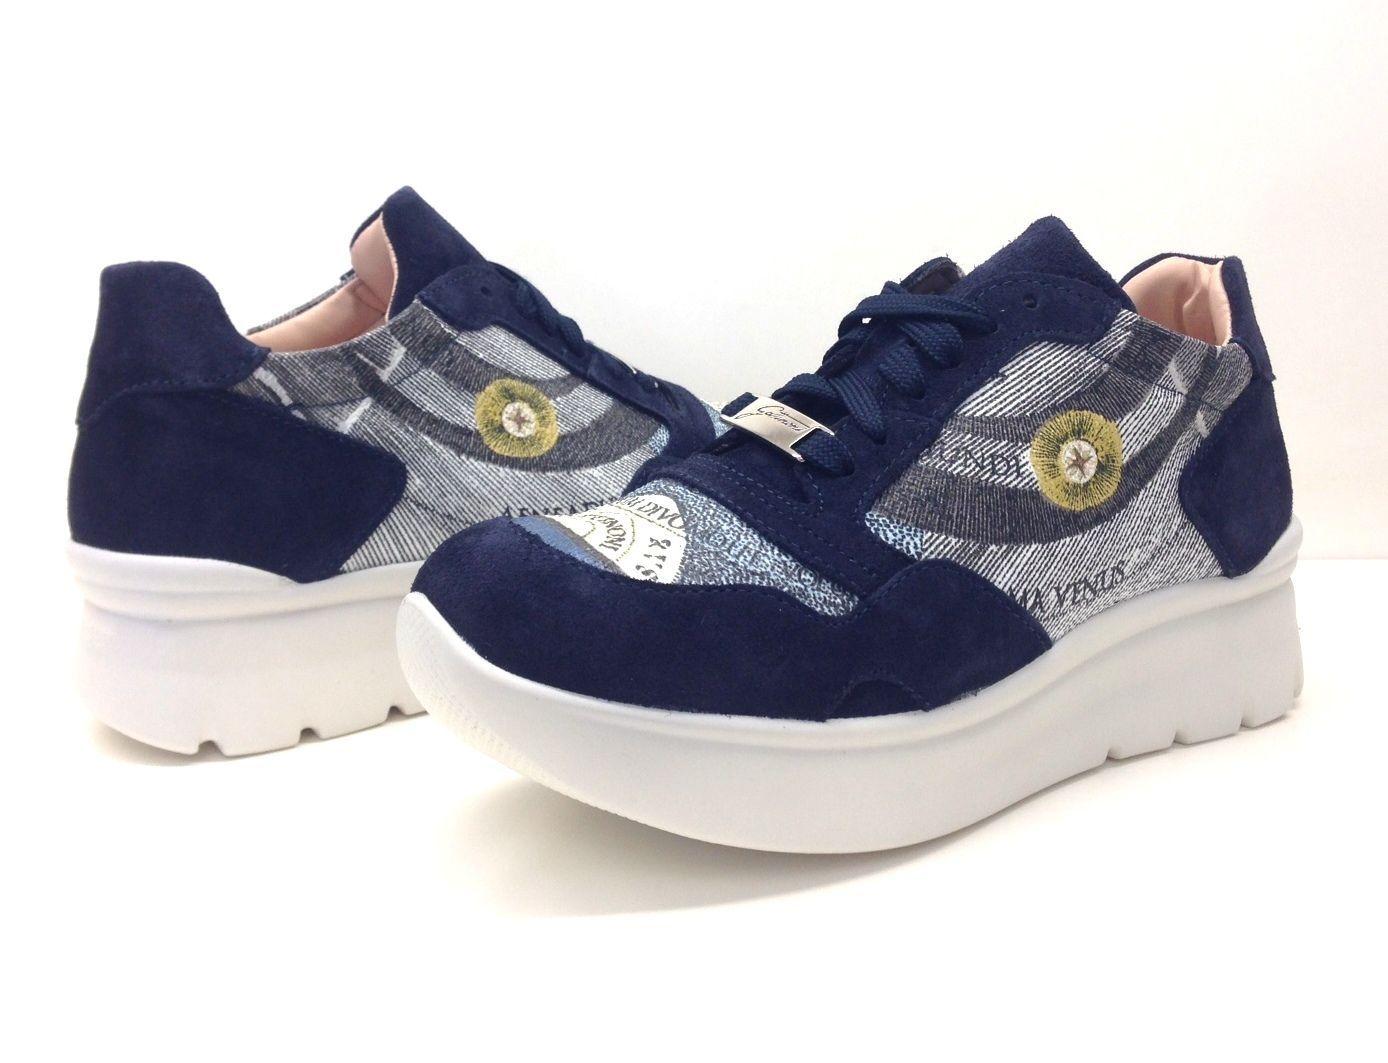 timeless design 6cd52 75cc5 GATTINONI scarpe donna sneaker lacci PEGVA6042WSB BEIGE,BLU ...